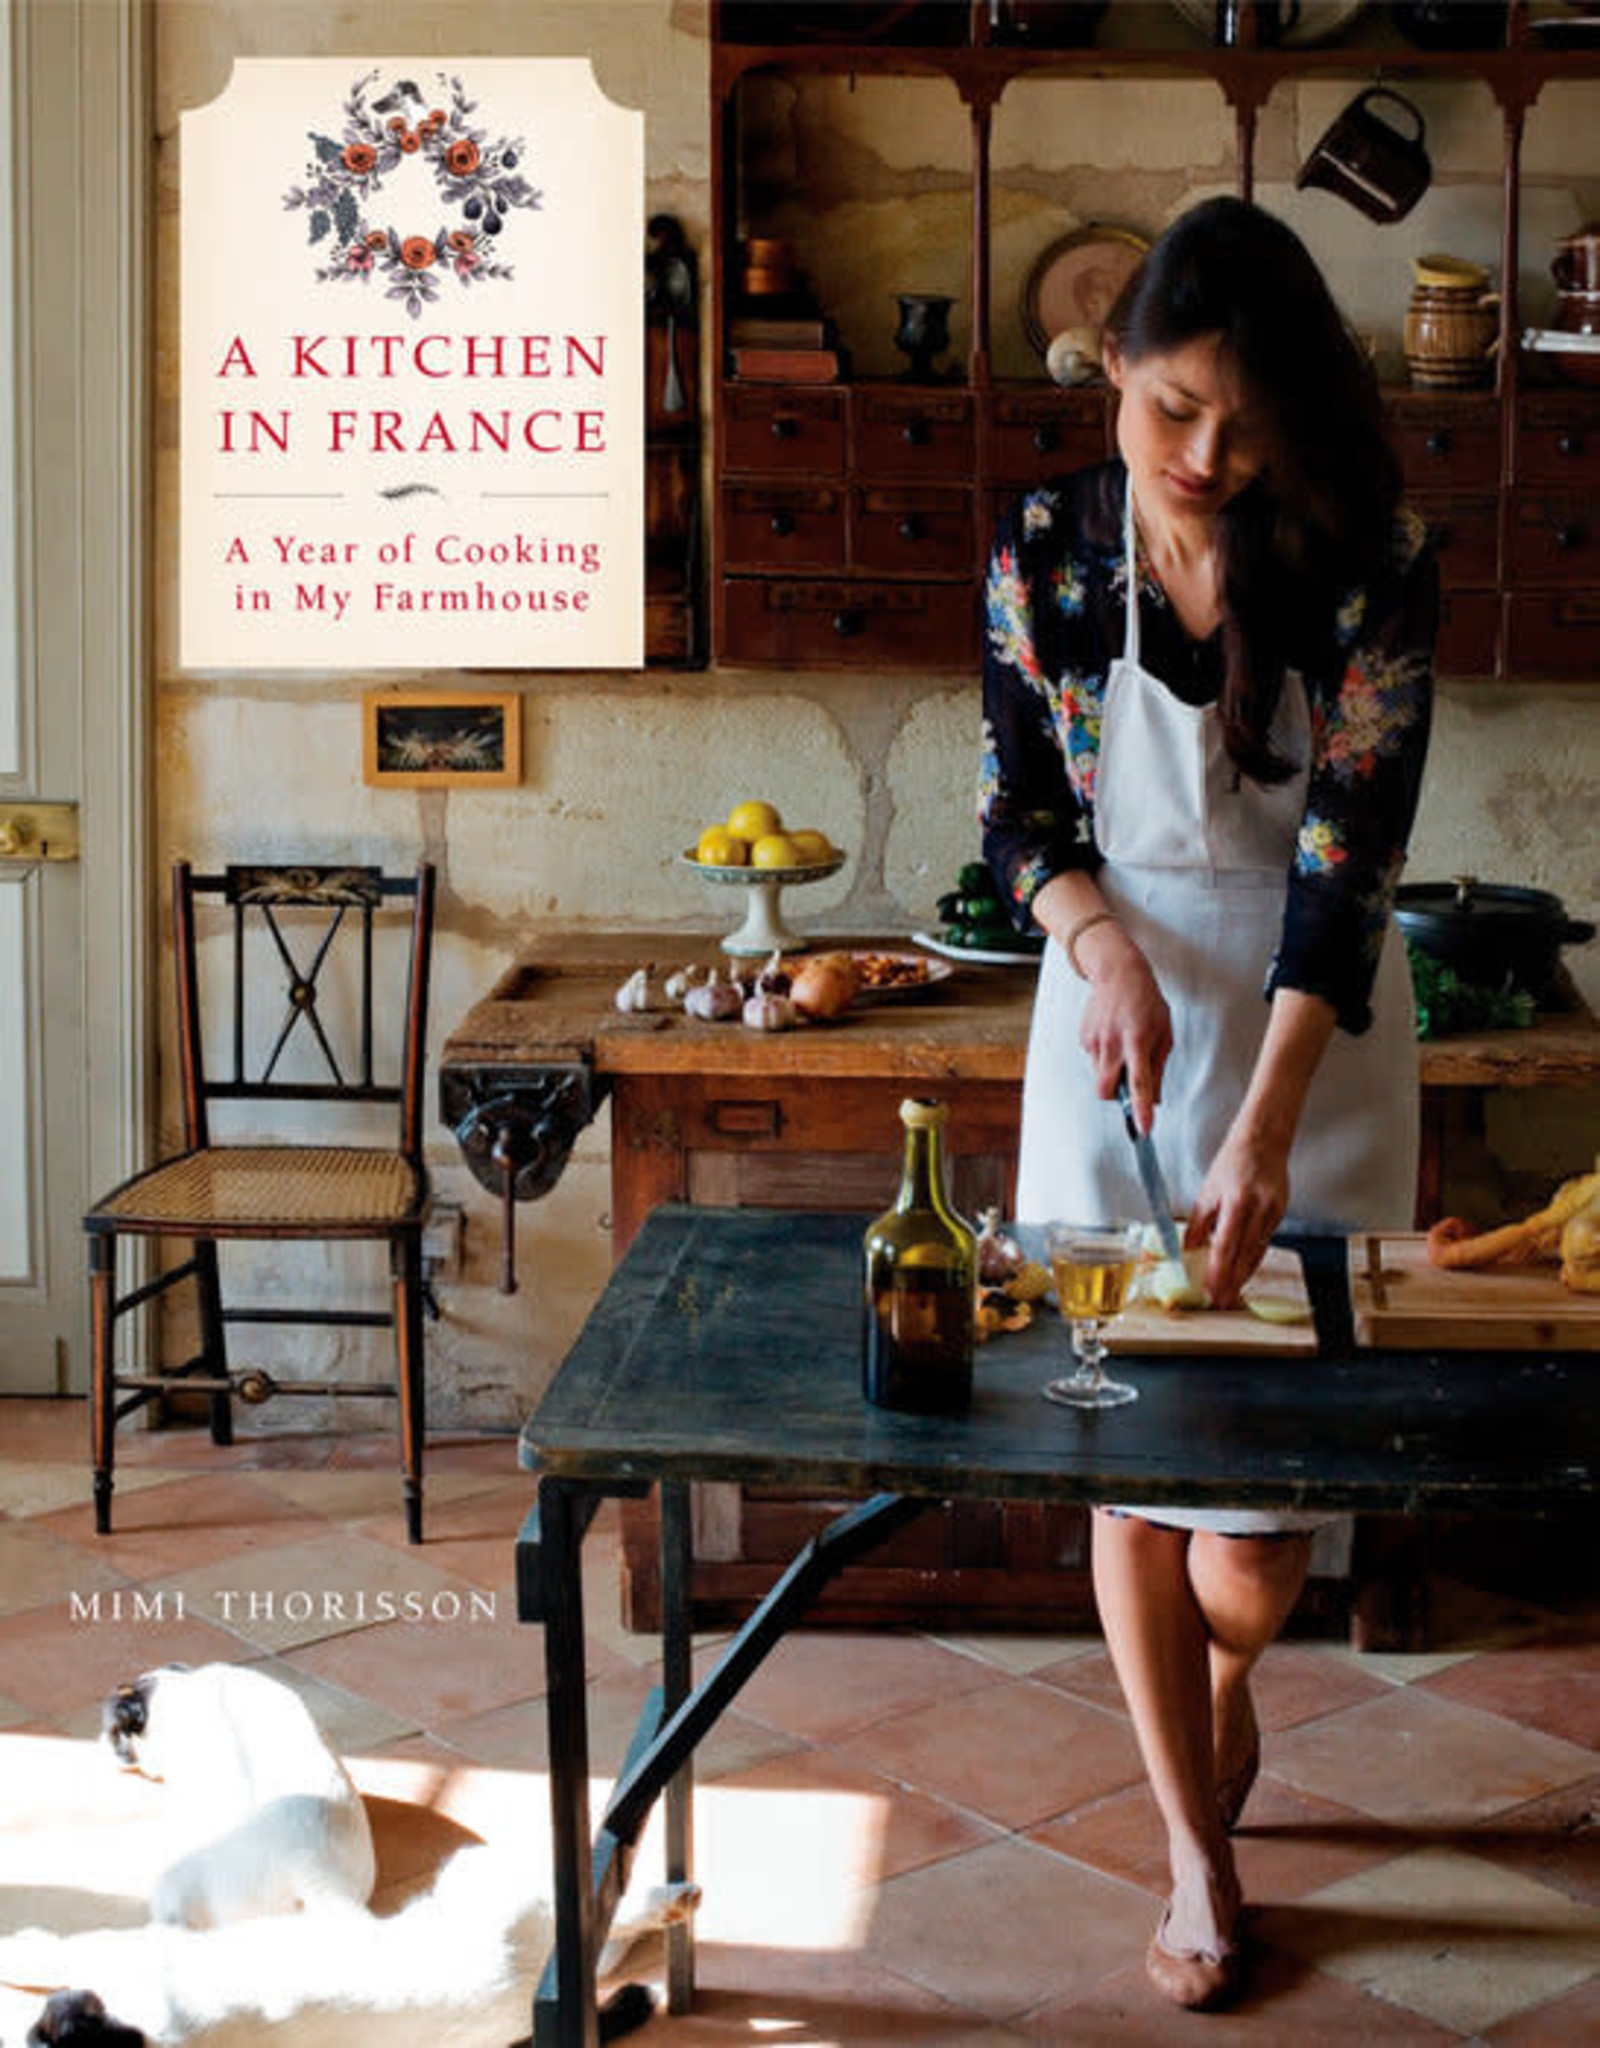 A kitchen in France, Mimi Thorisson